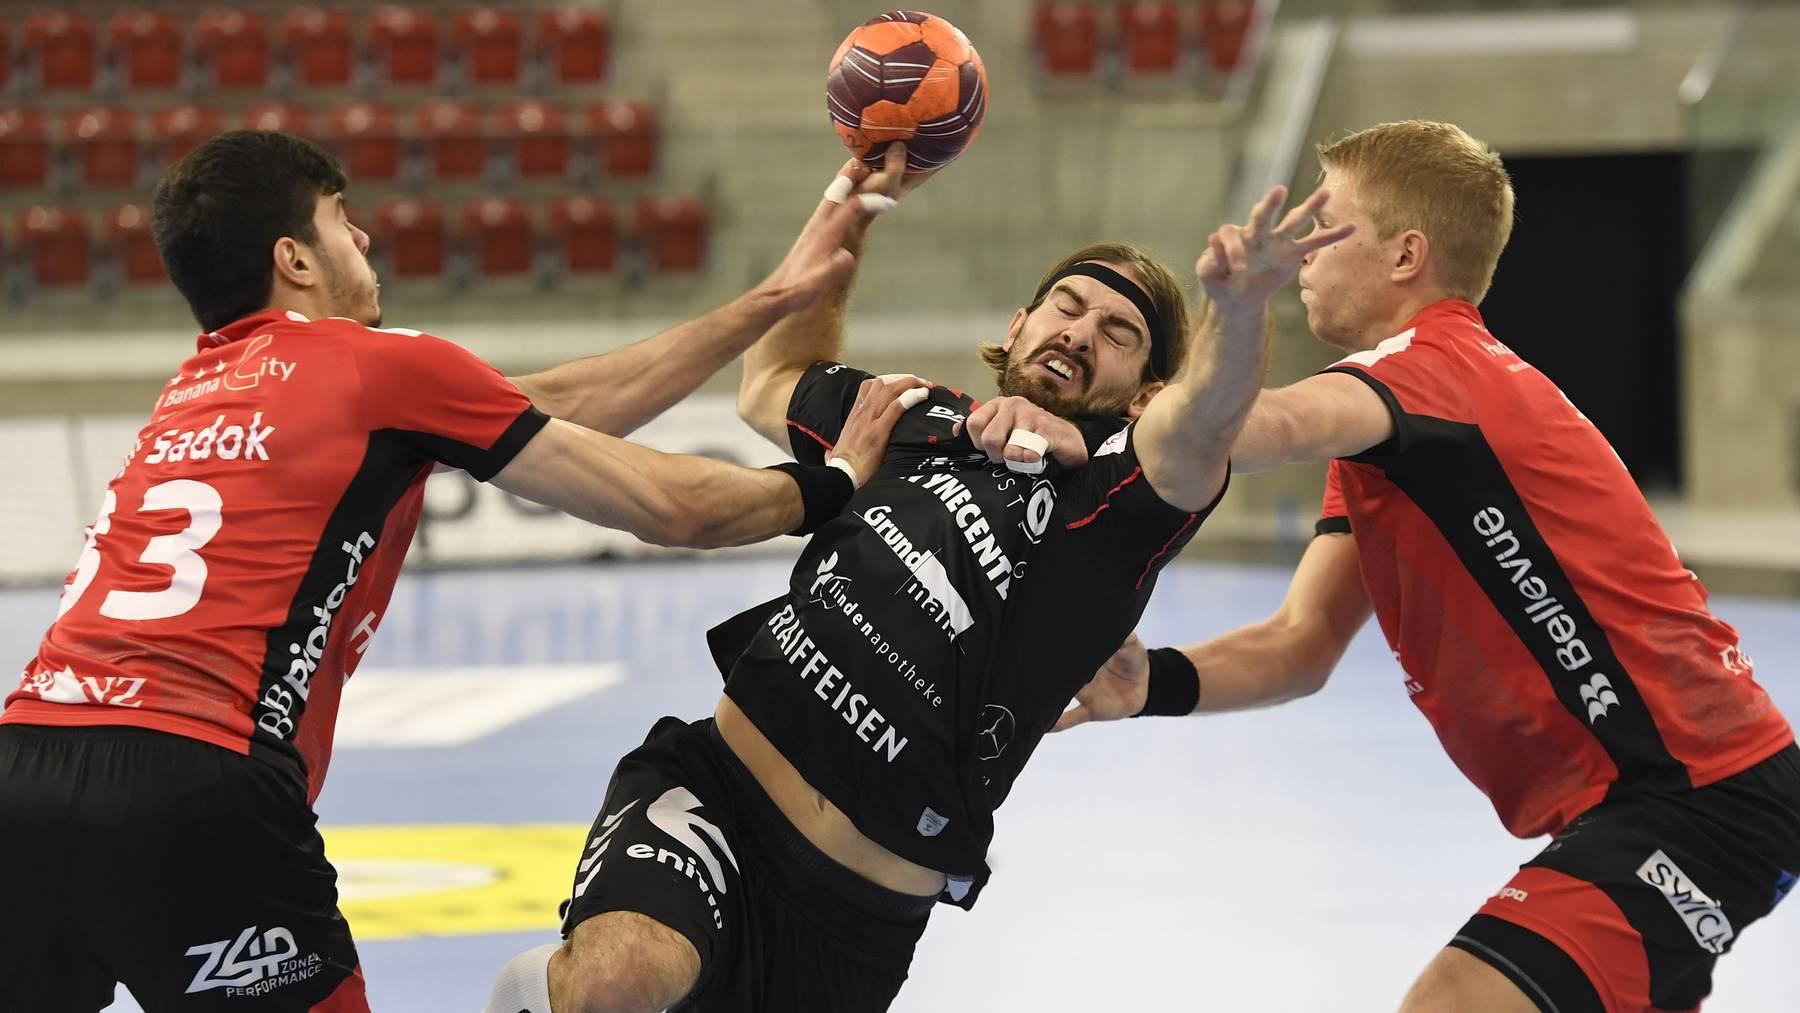 HSC Suhr Aarau vs. Pfadi Winterthur